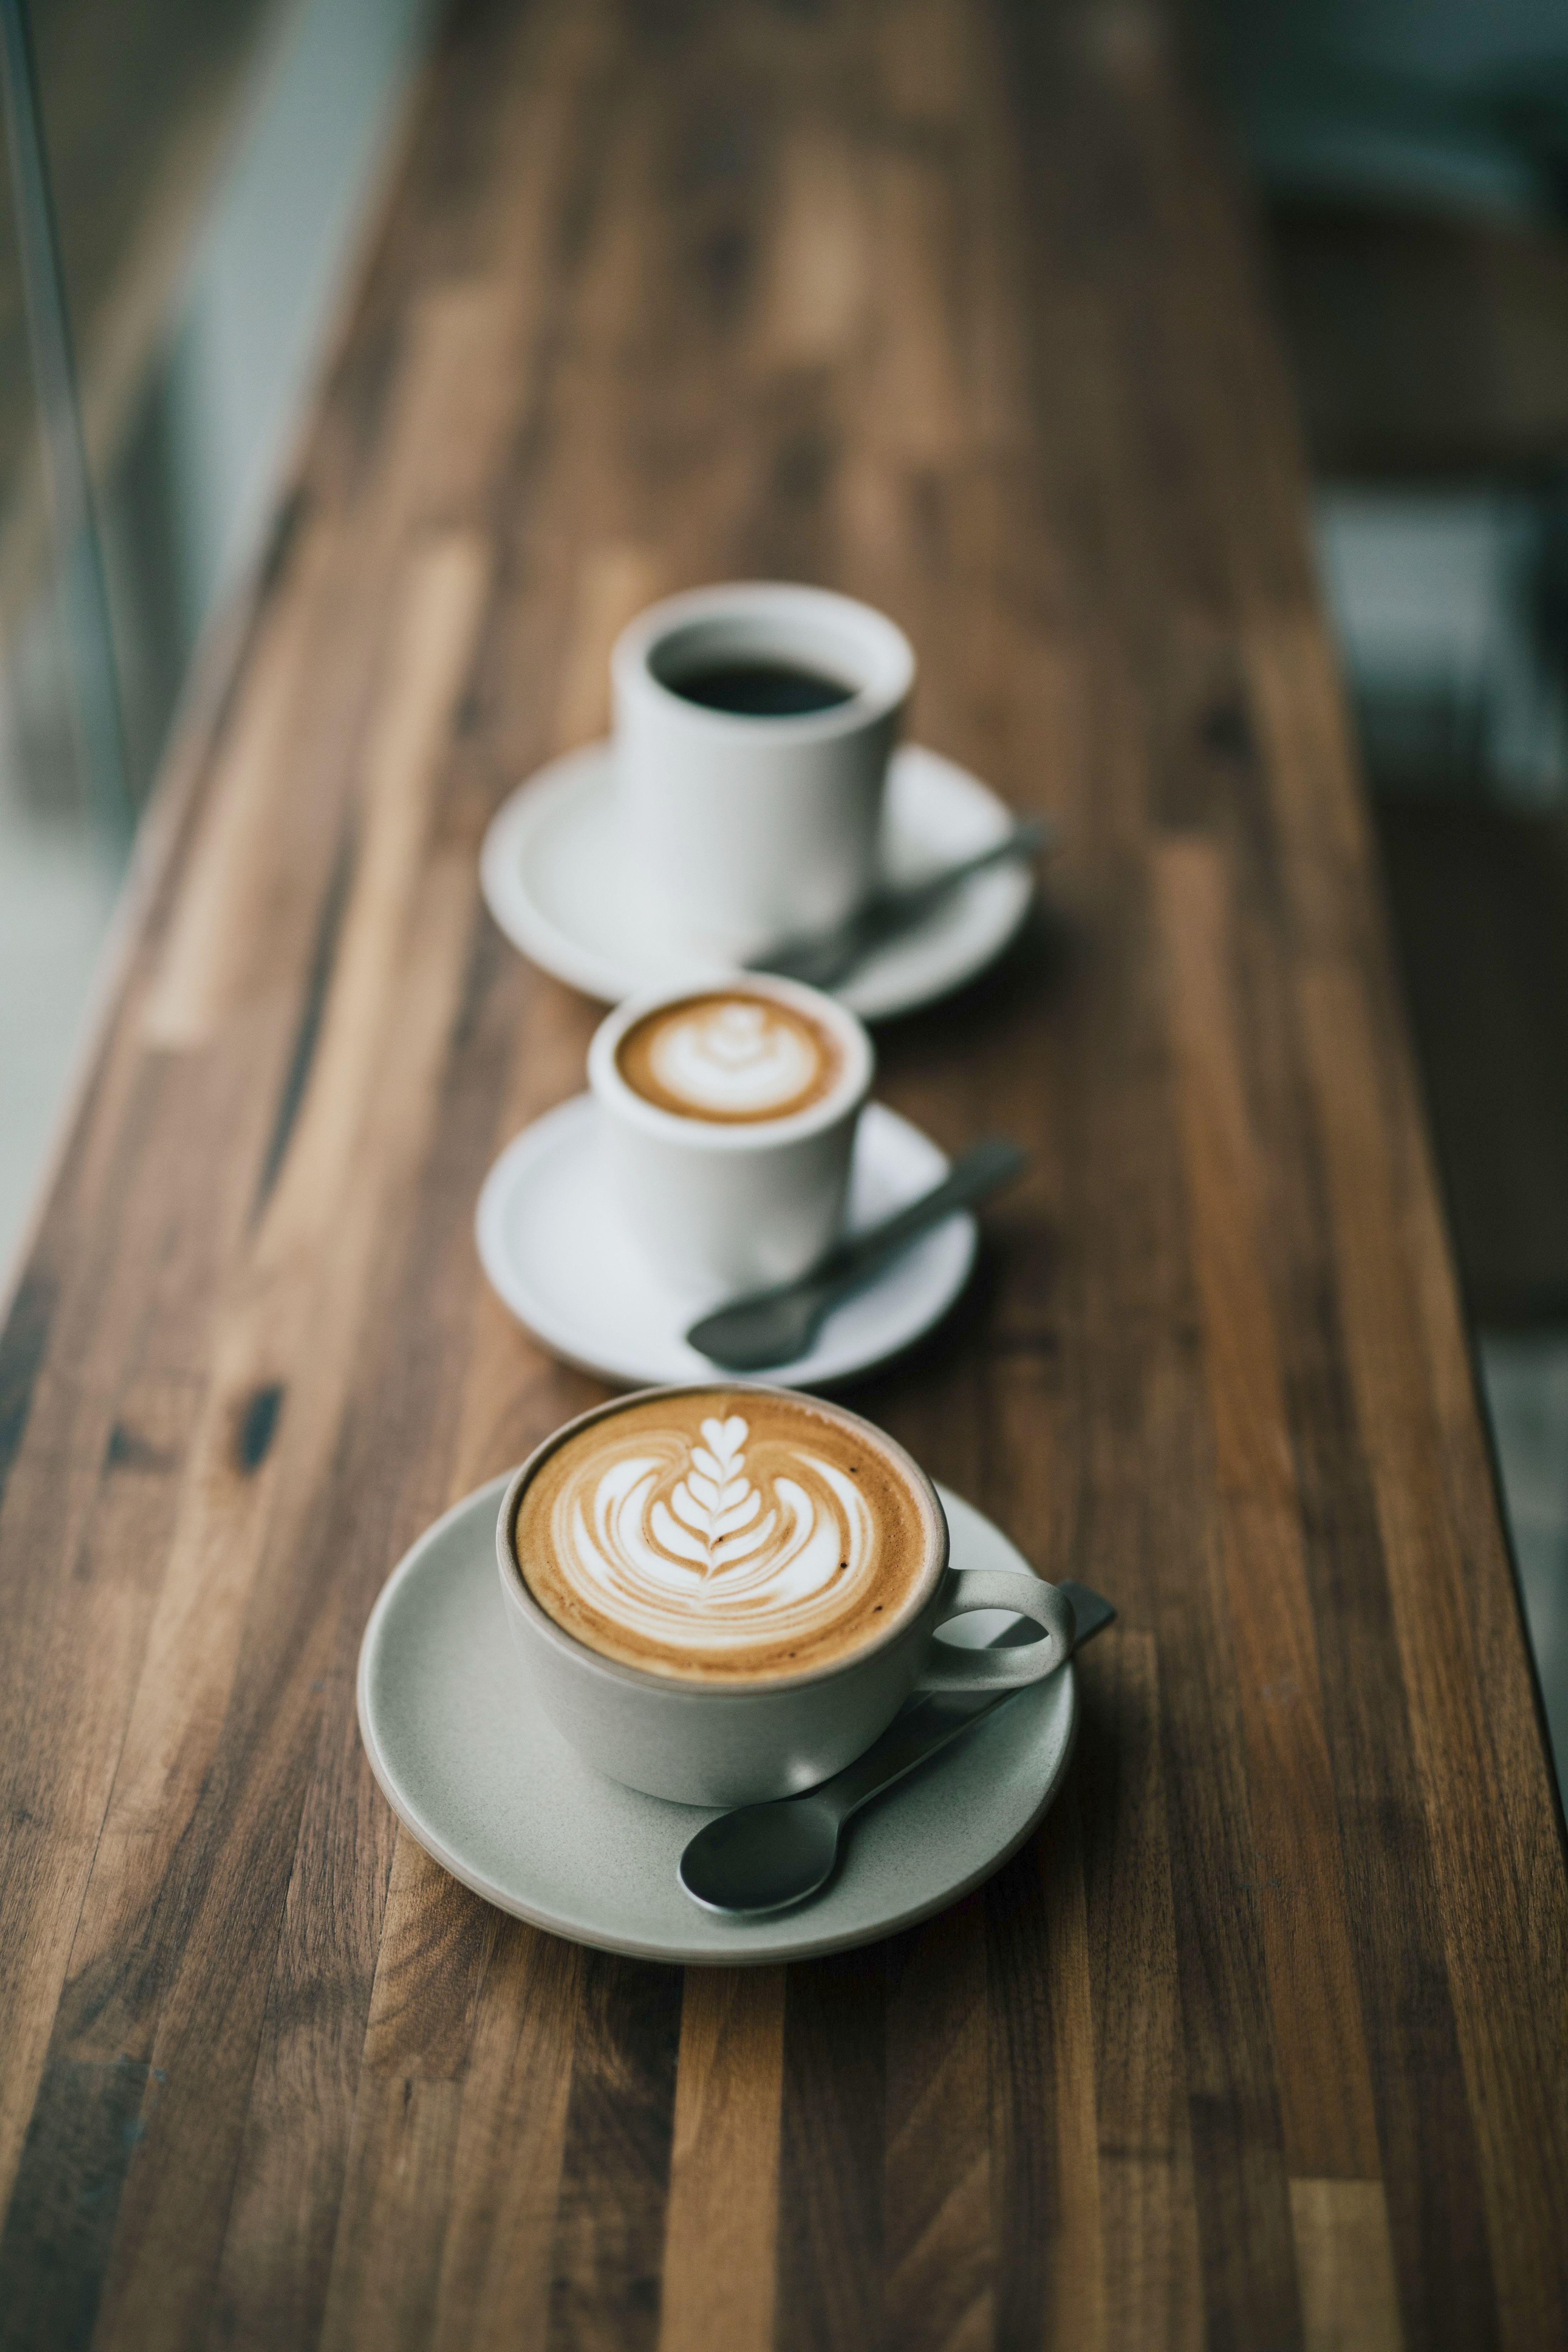 Coffee Table Jazz Spotify Into Coffee Table Organizer If Coffee Shops Near Me Boulder Up Coffee Shop Anaheim Fotografia De Cafe Imagenes De Cafe Fotos De Cafe